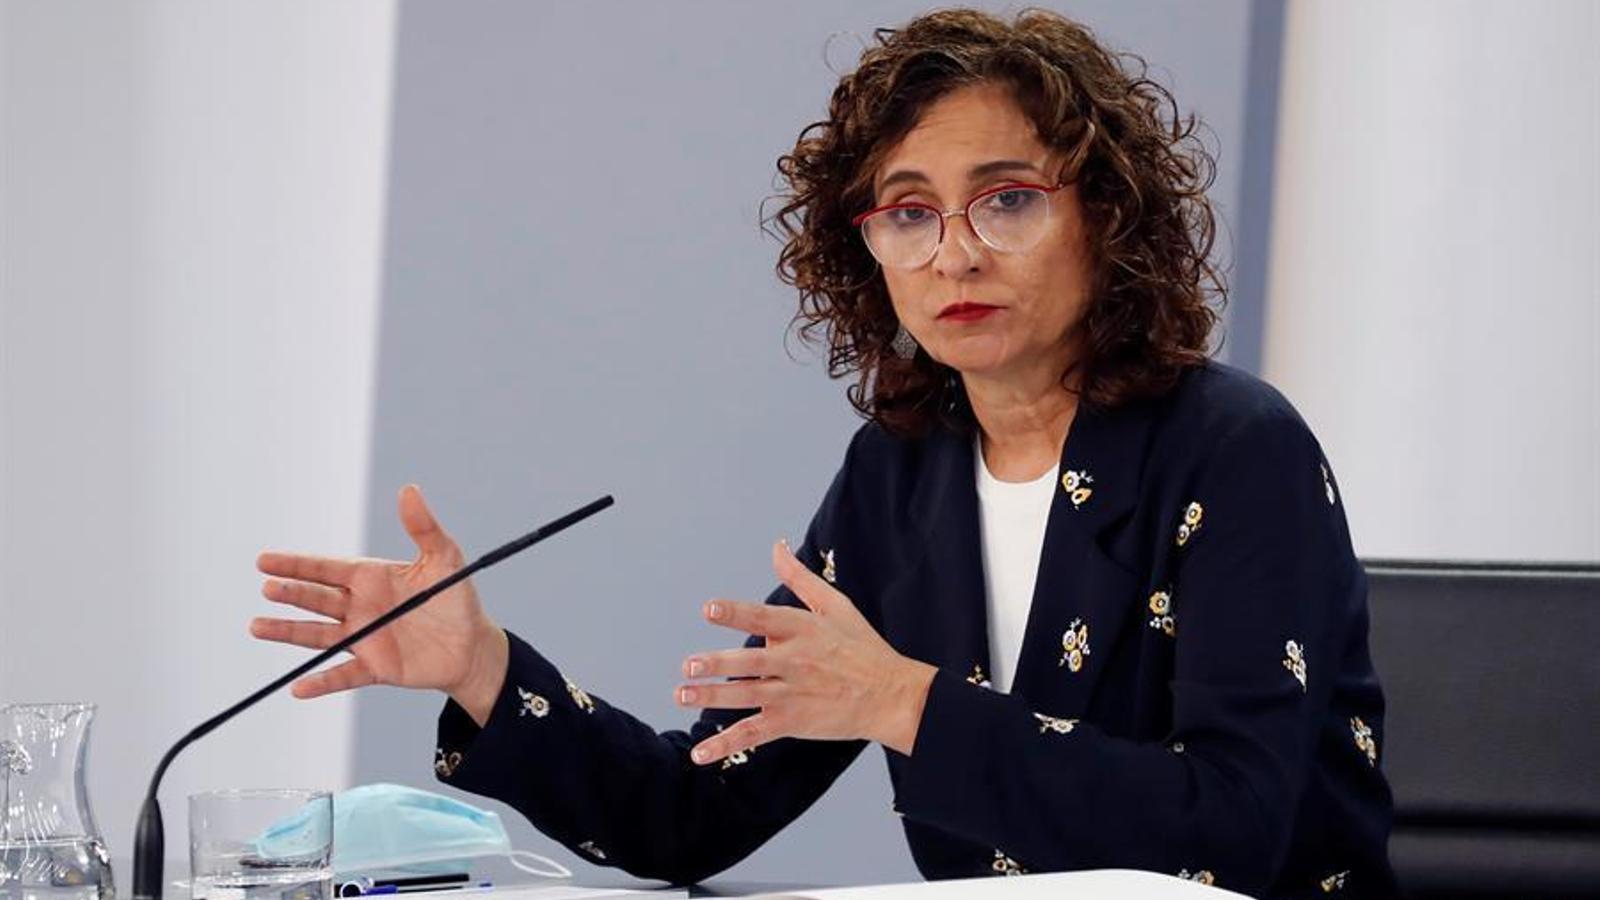 La ministra d'Hisenda i portaveu del Govern espanyol, María Jesús Montero.